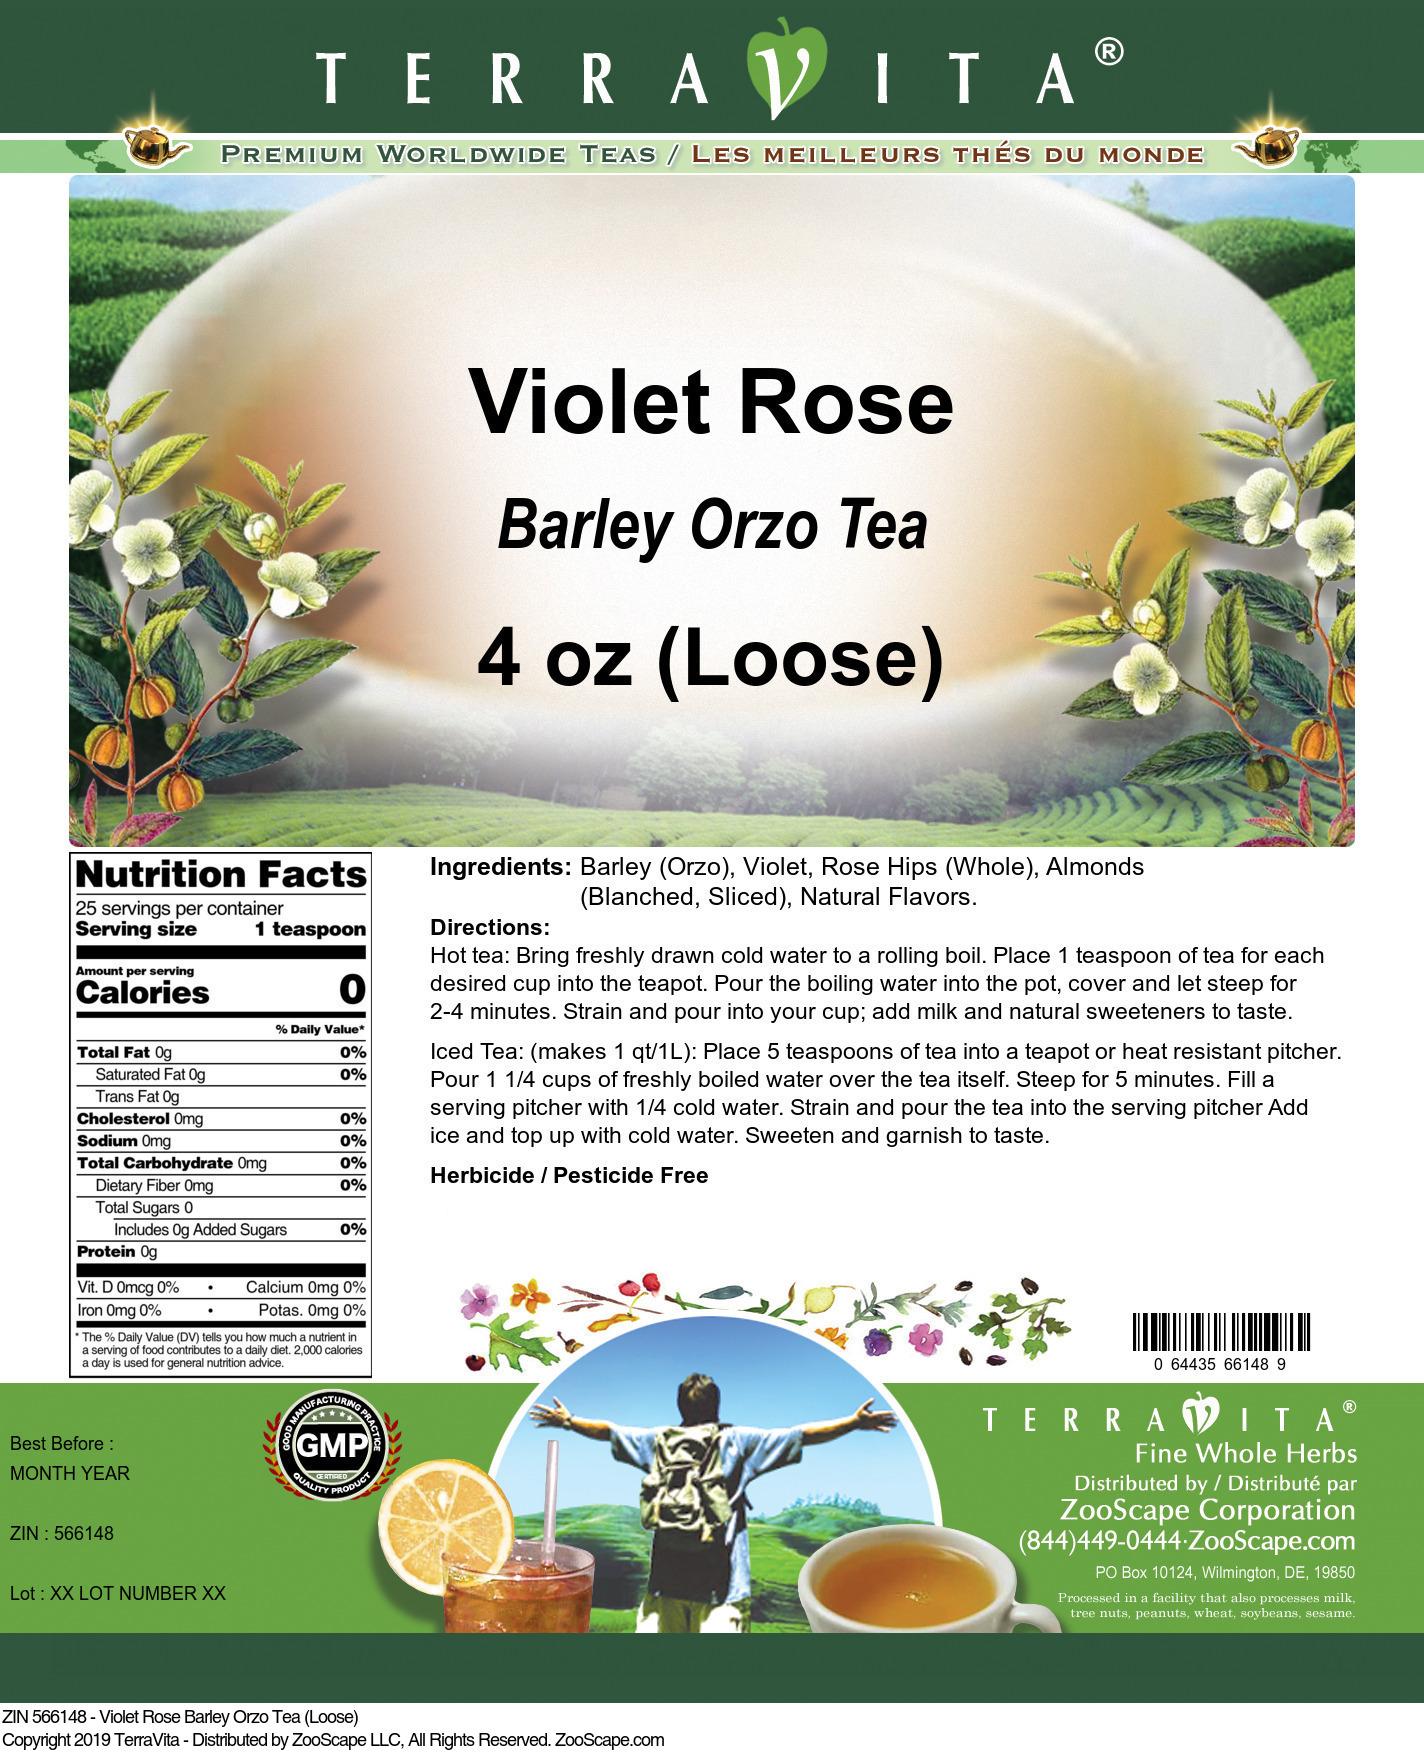 Violet Rose Barley Orzo